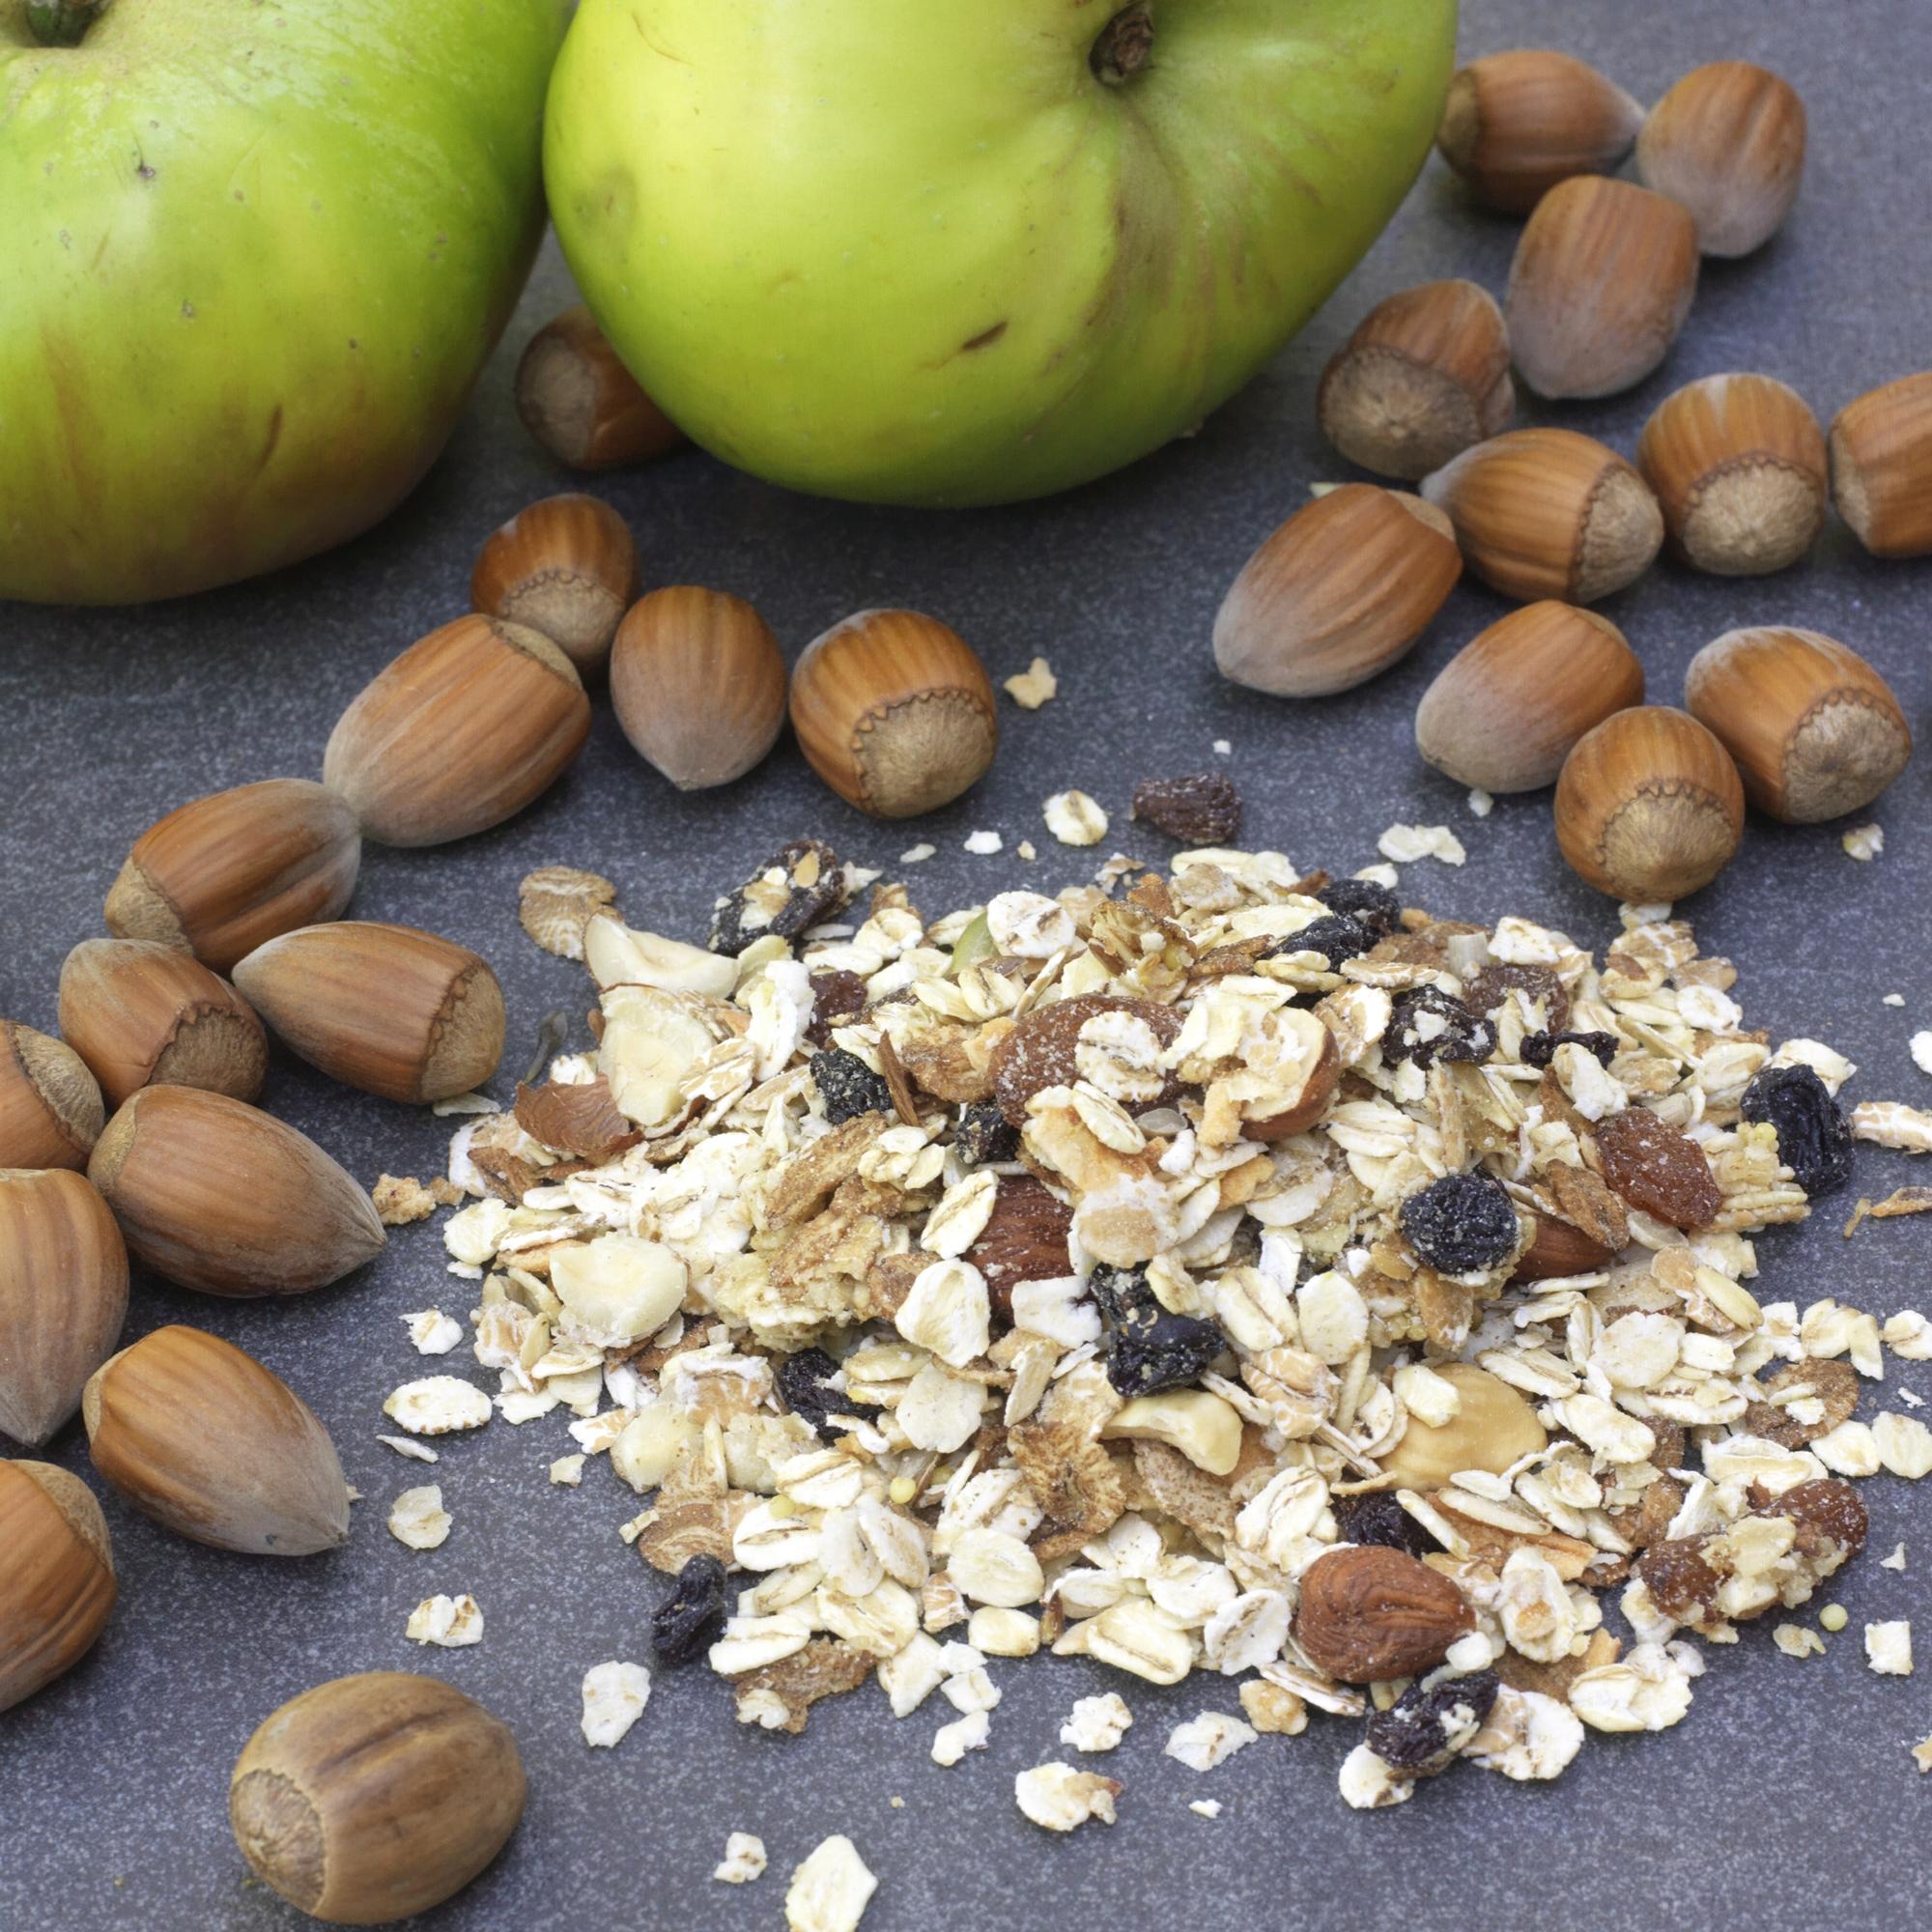 Kentish Cobnut And Bramley Apple Granola Muesli - A very healthy granola muesli made with oats, Kentish Cobnuts, mixed seeds, and Kentish Bramley apple.